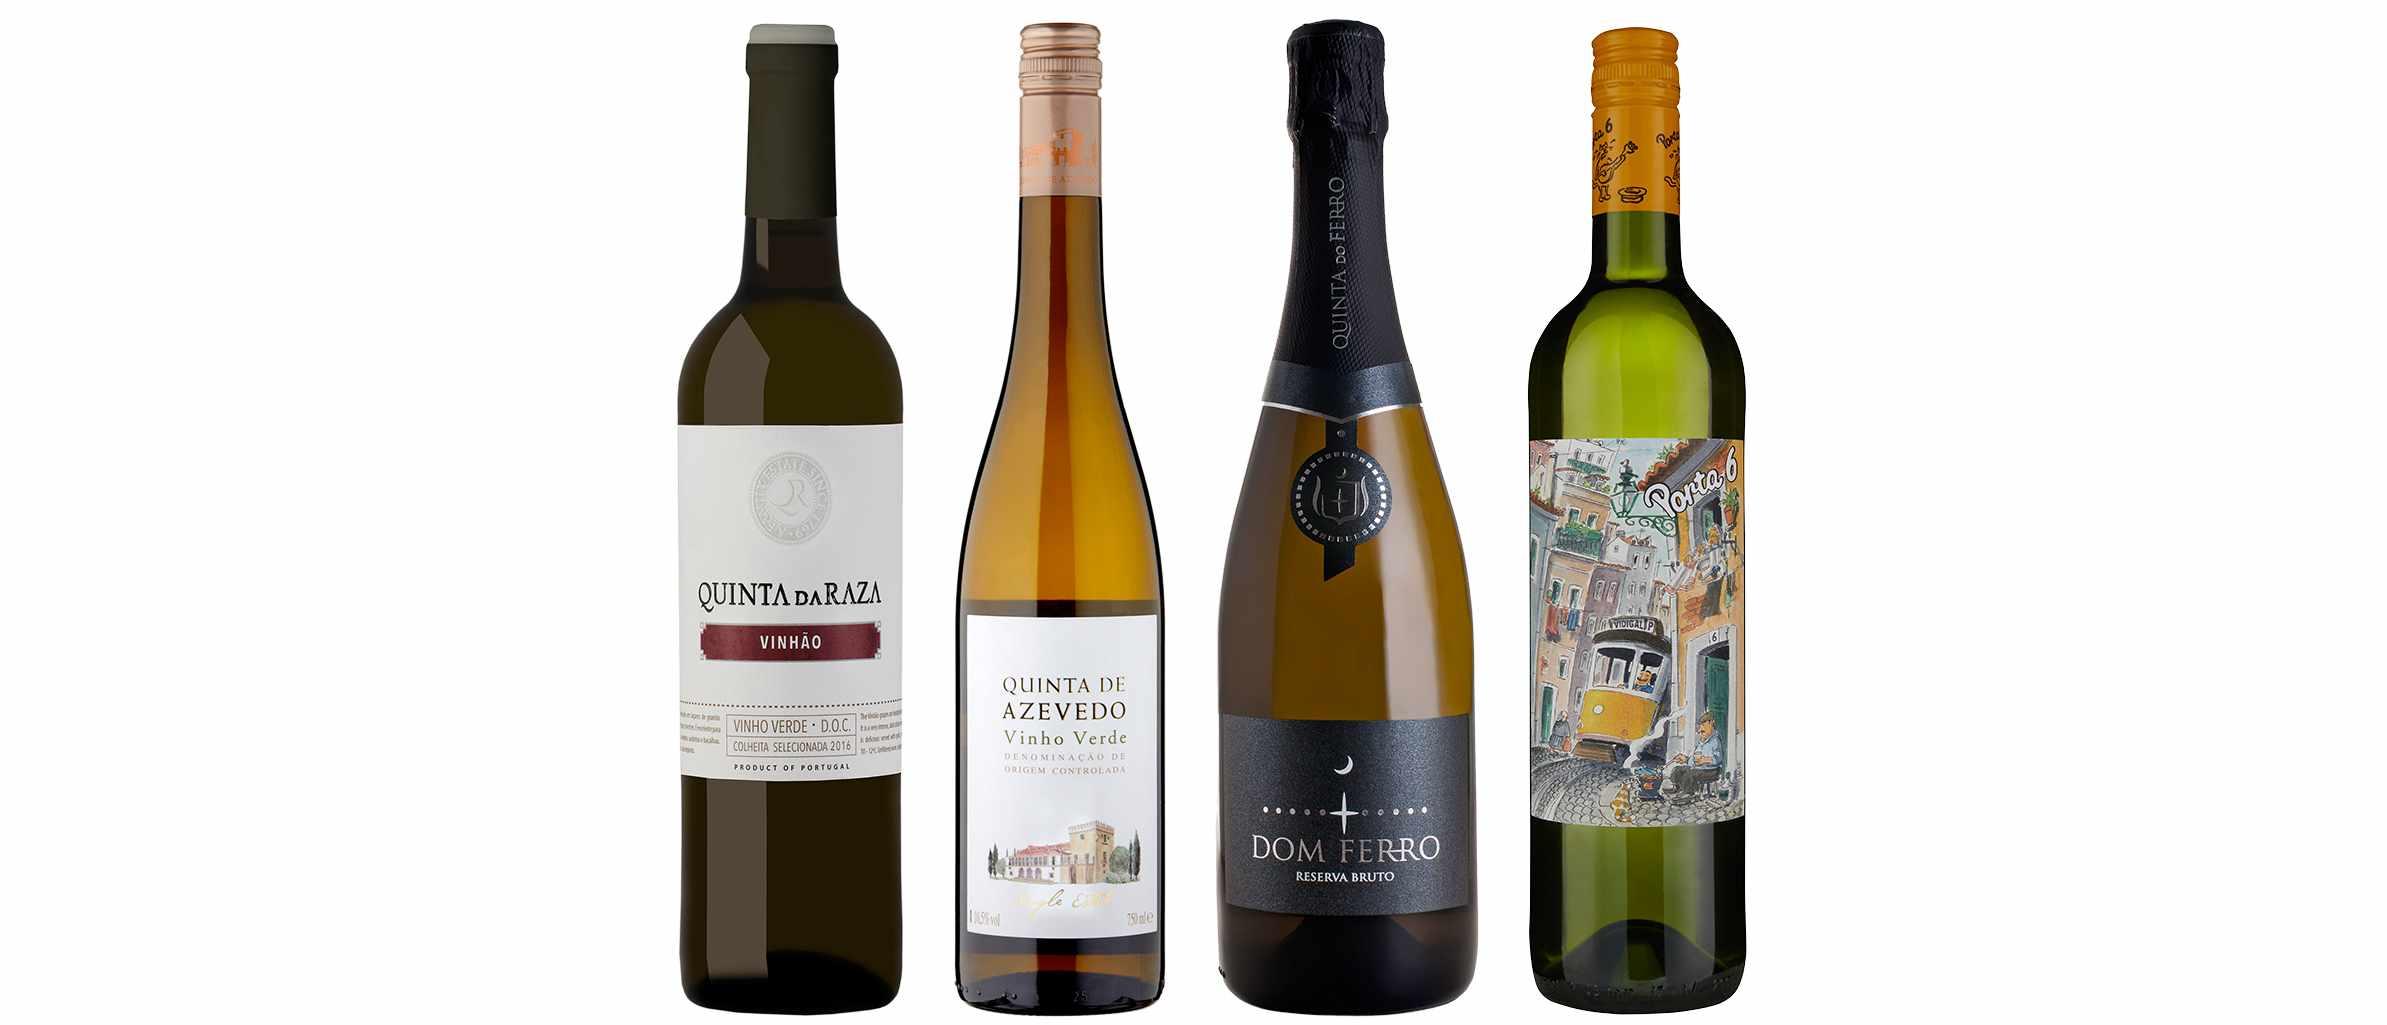 A selection of four bottles of Vinho Verde wine